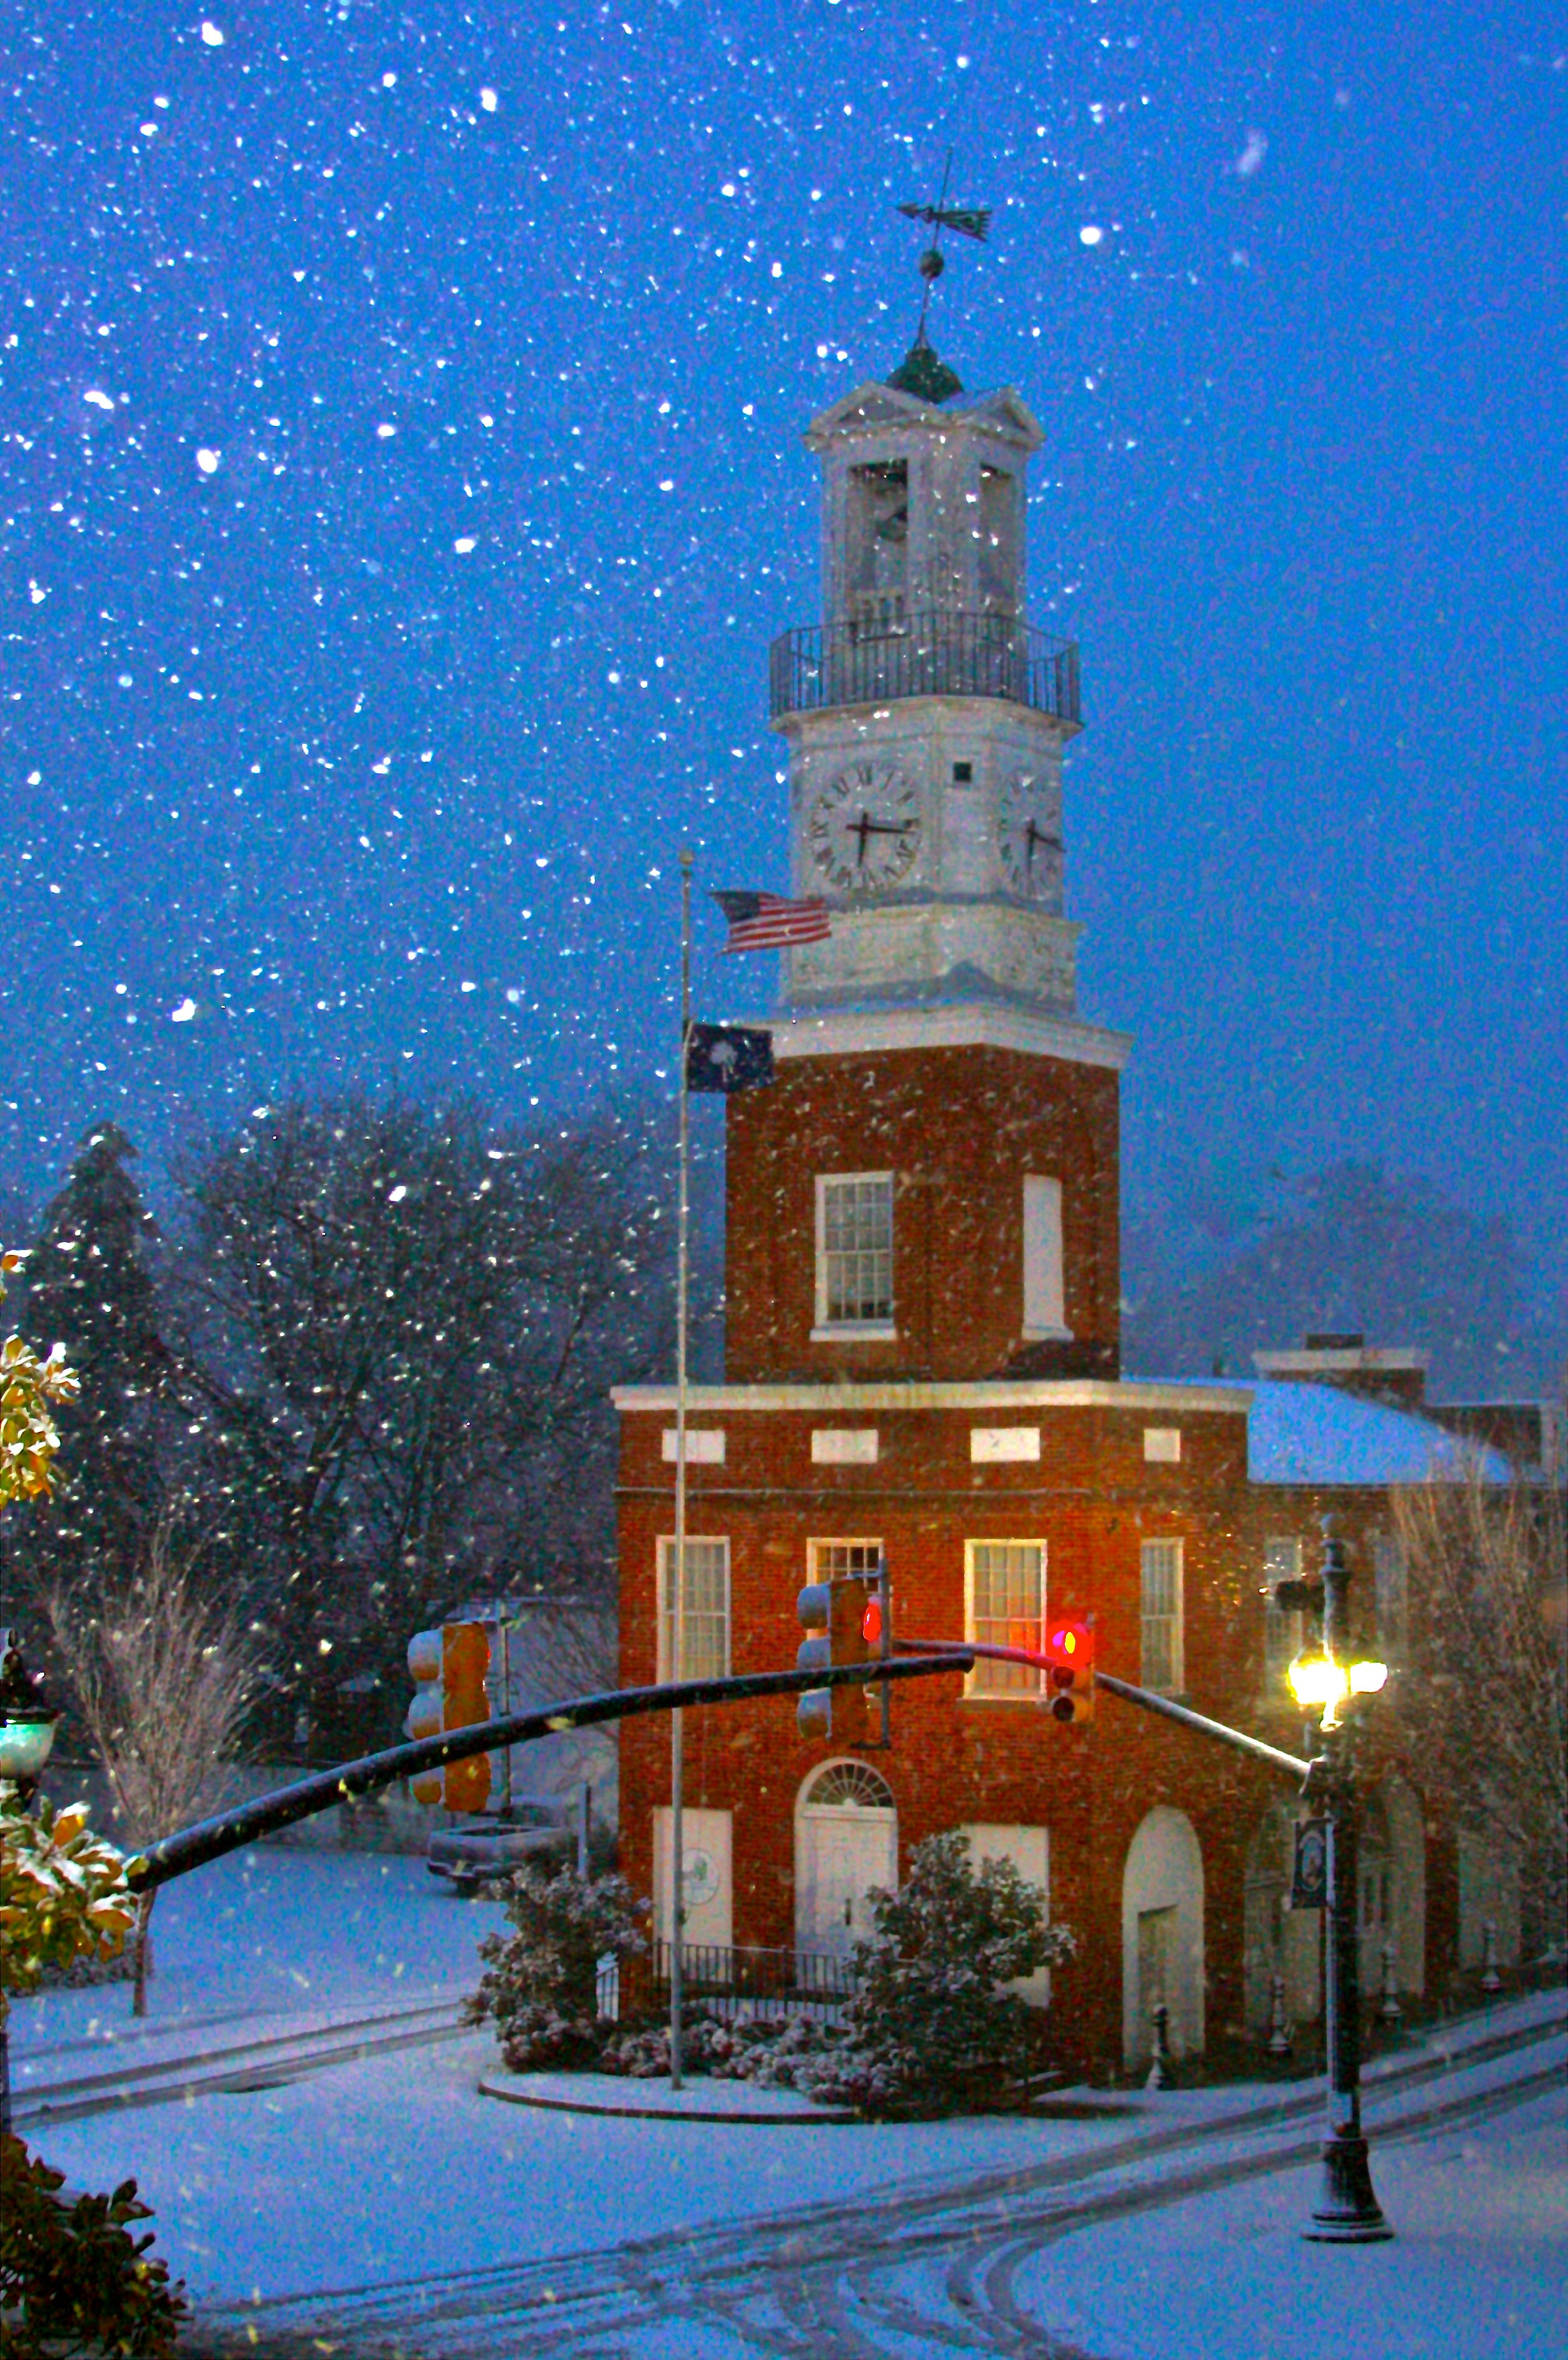 Town Clock Winnsboro Sc Oldest Running Clock In The United States Winnsboro South Carolina America Travel